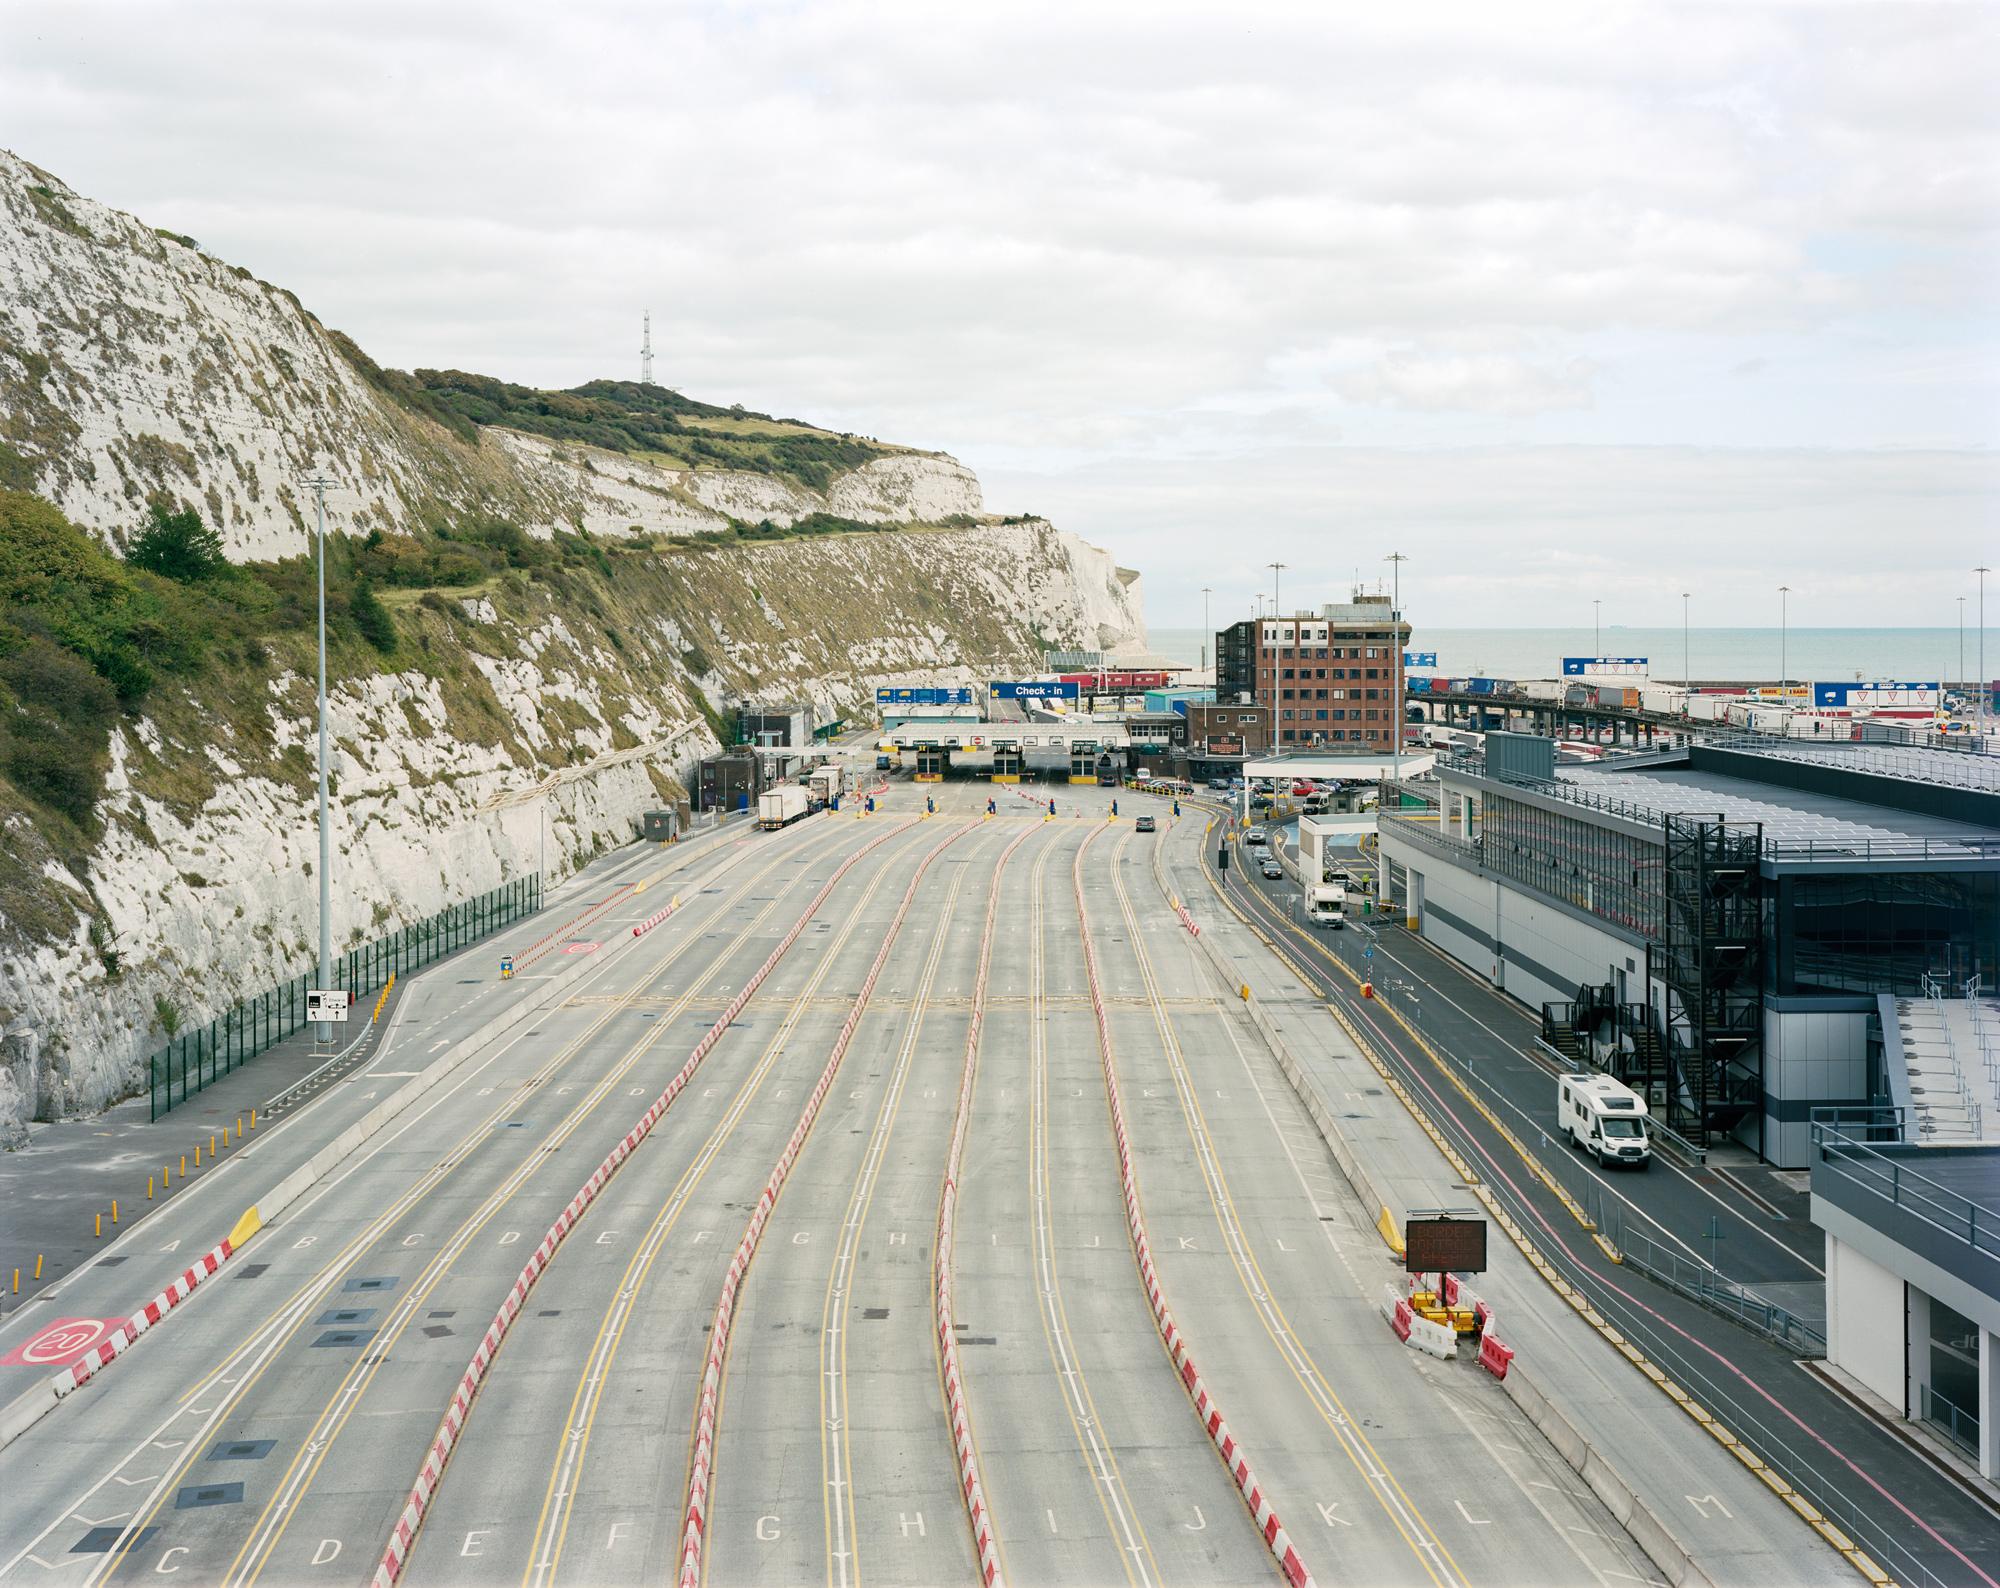 72 Miles to Dover - Tudor Prisăcariu